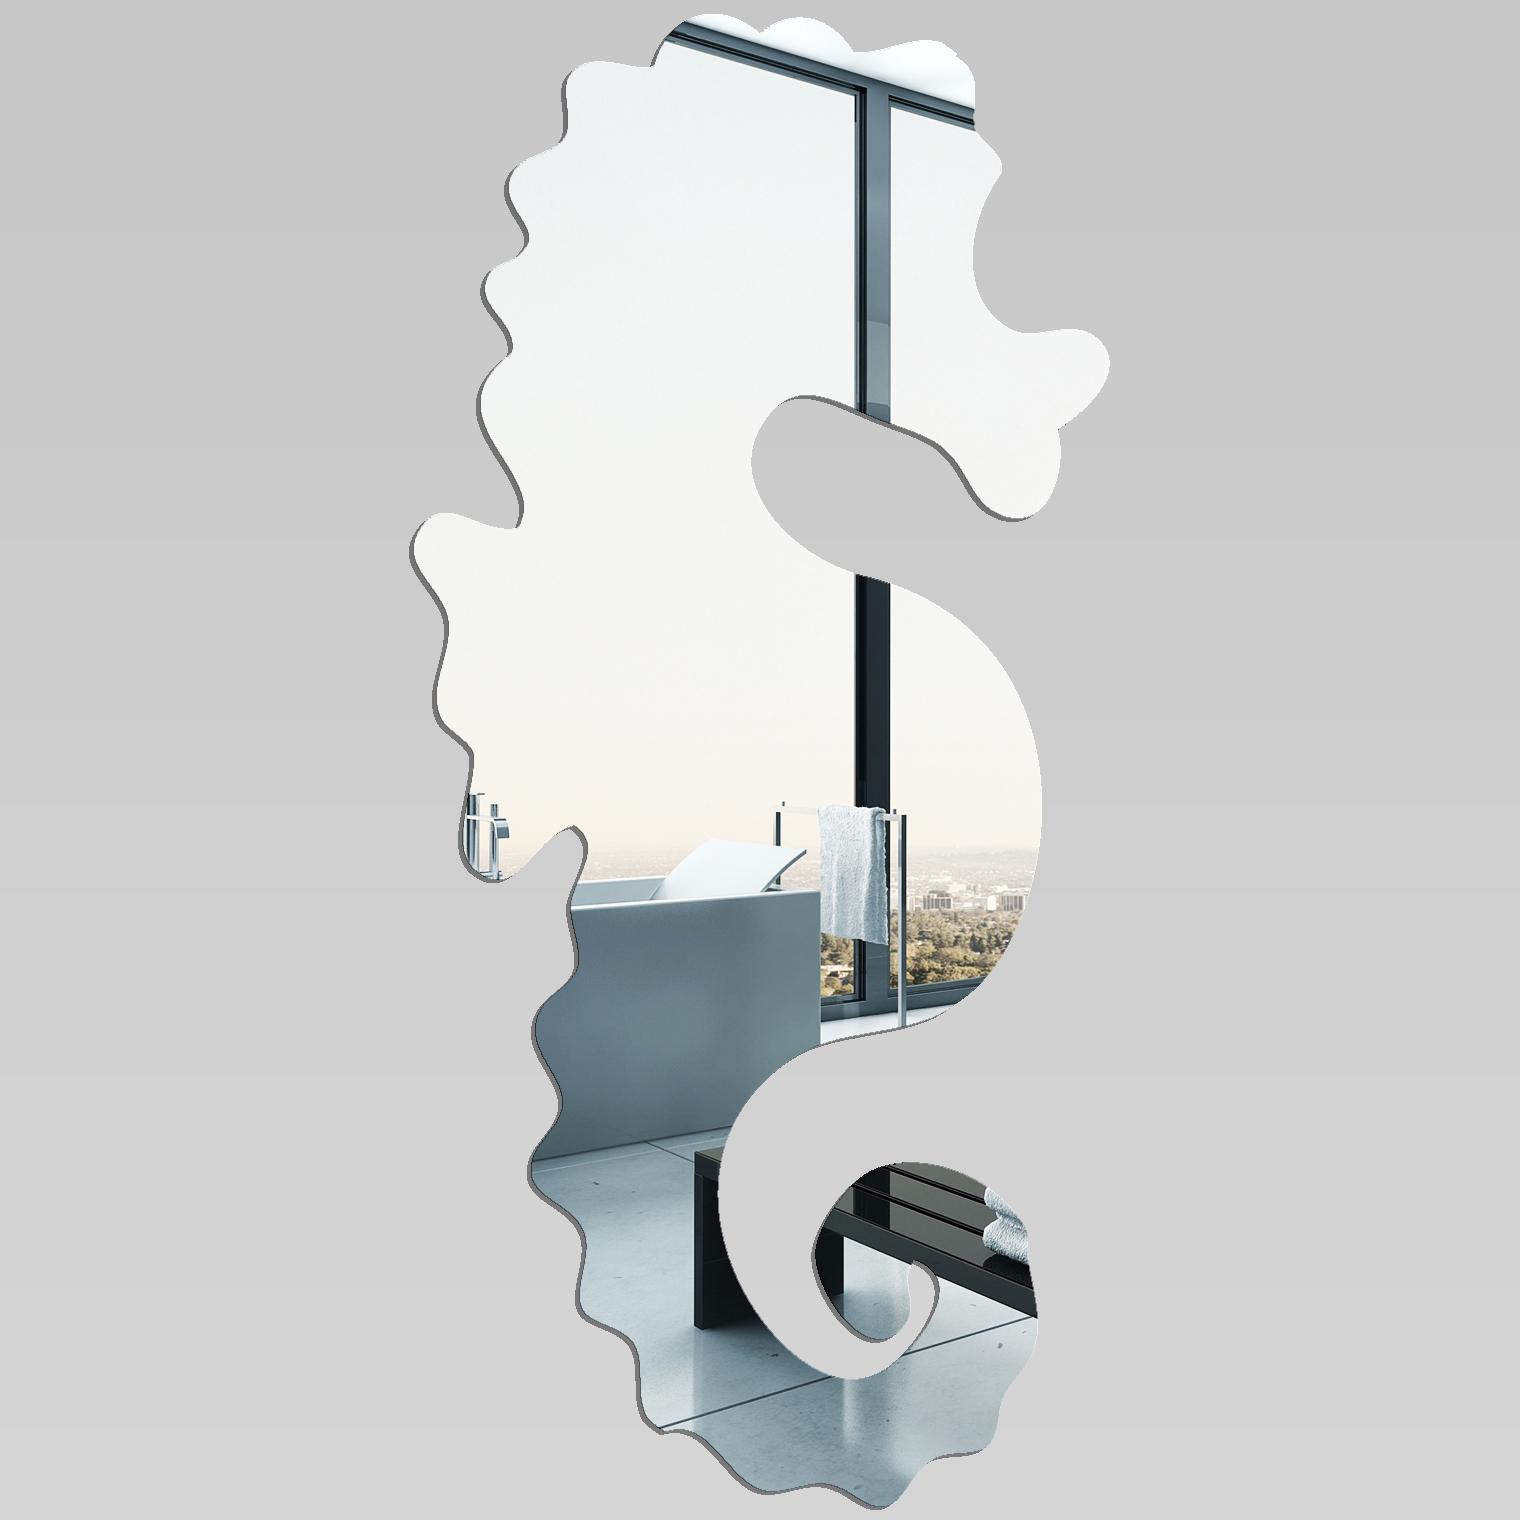 miroir plexiglass acrylique hippocampe pas cher. Black Bedroom Furniture Sets. Home Design Ideas